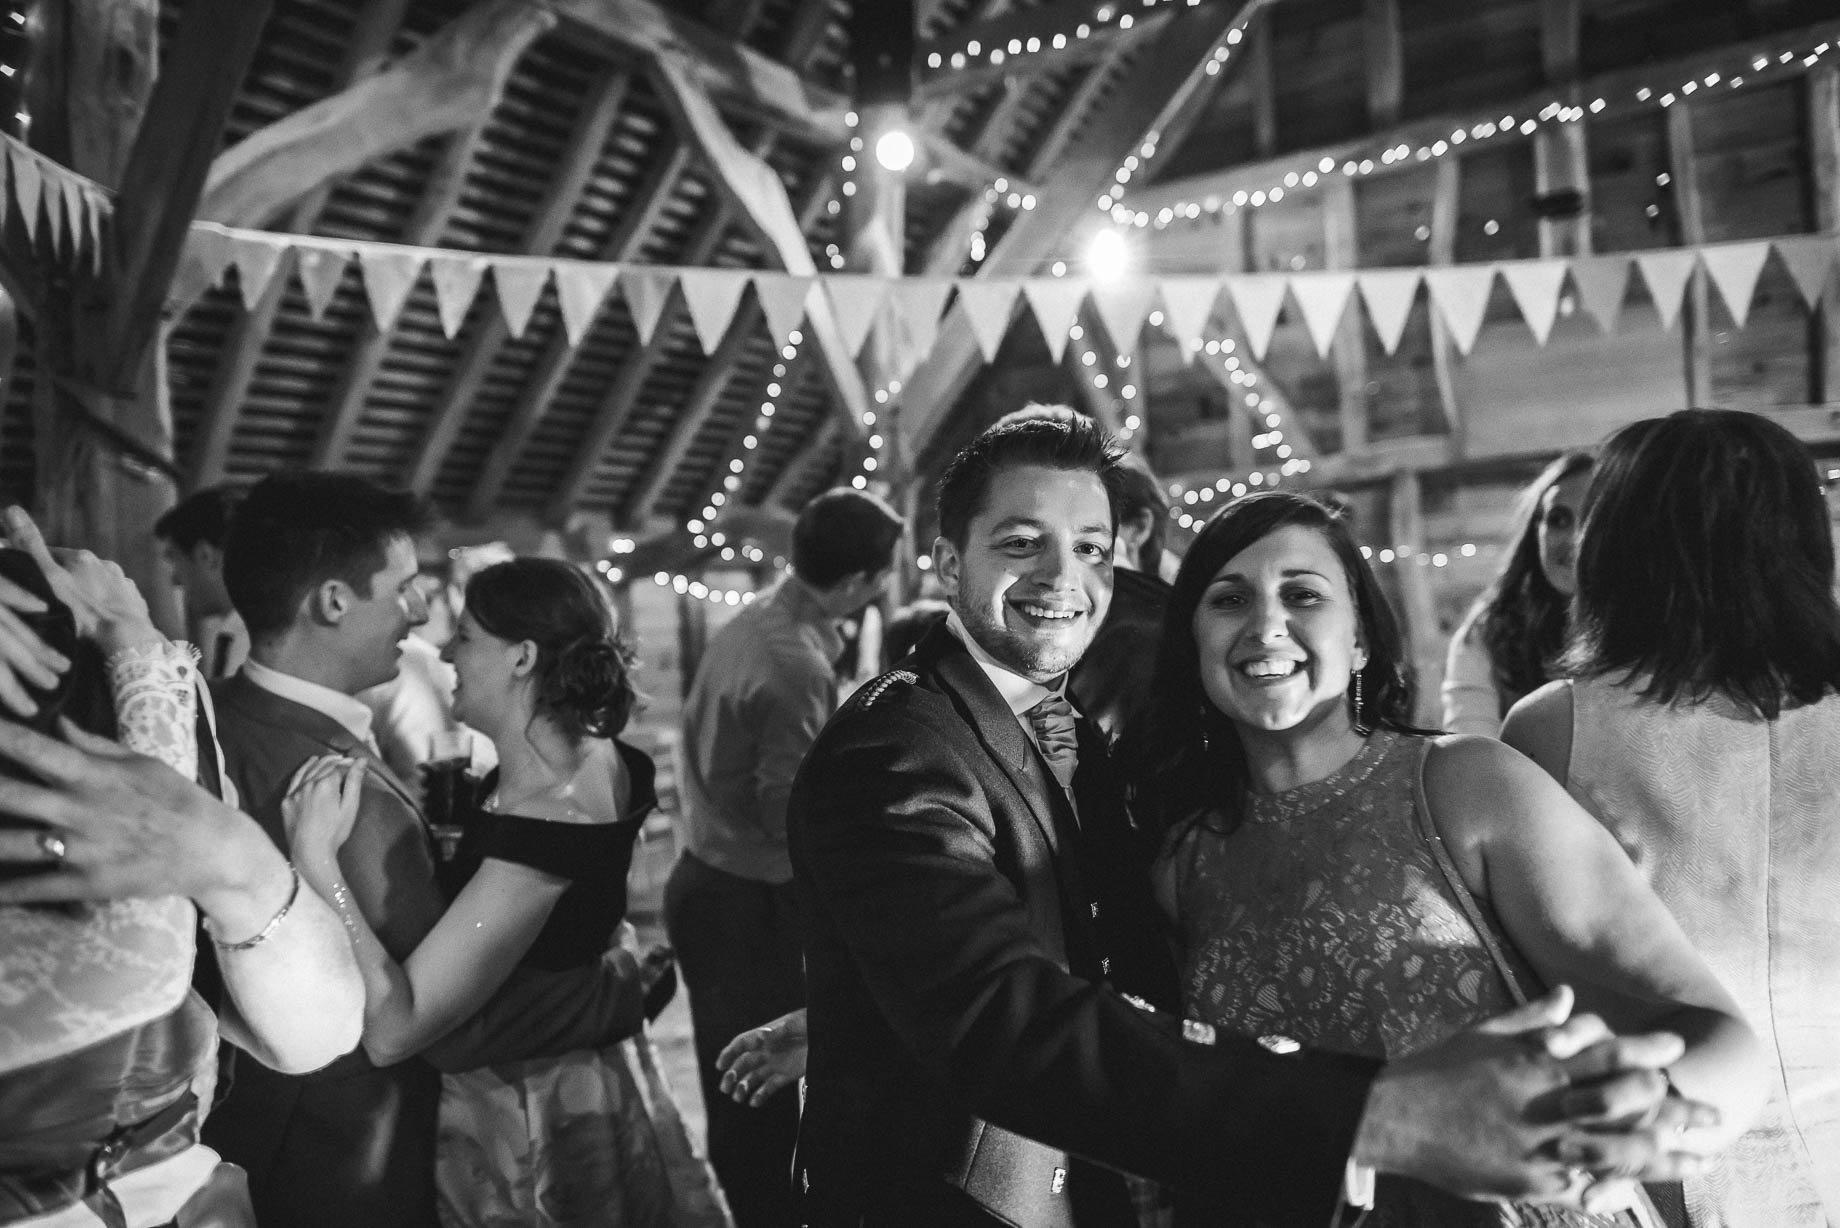 Gildings Barn wedding photography - Sarah and Steve (186 of 190)